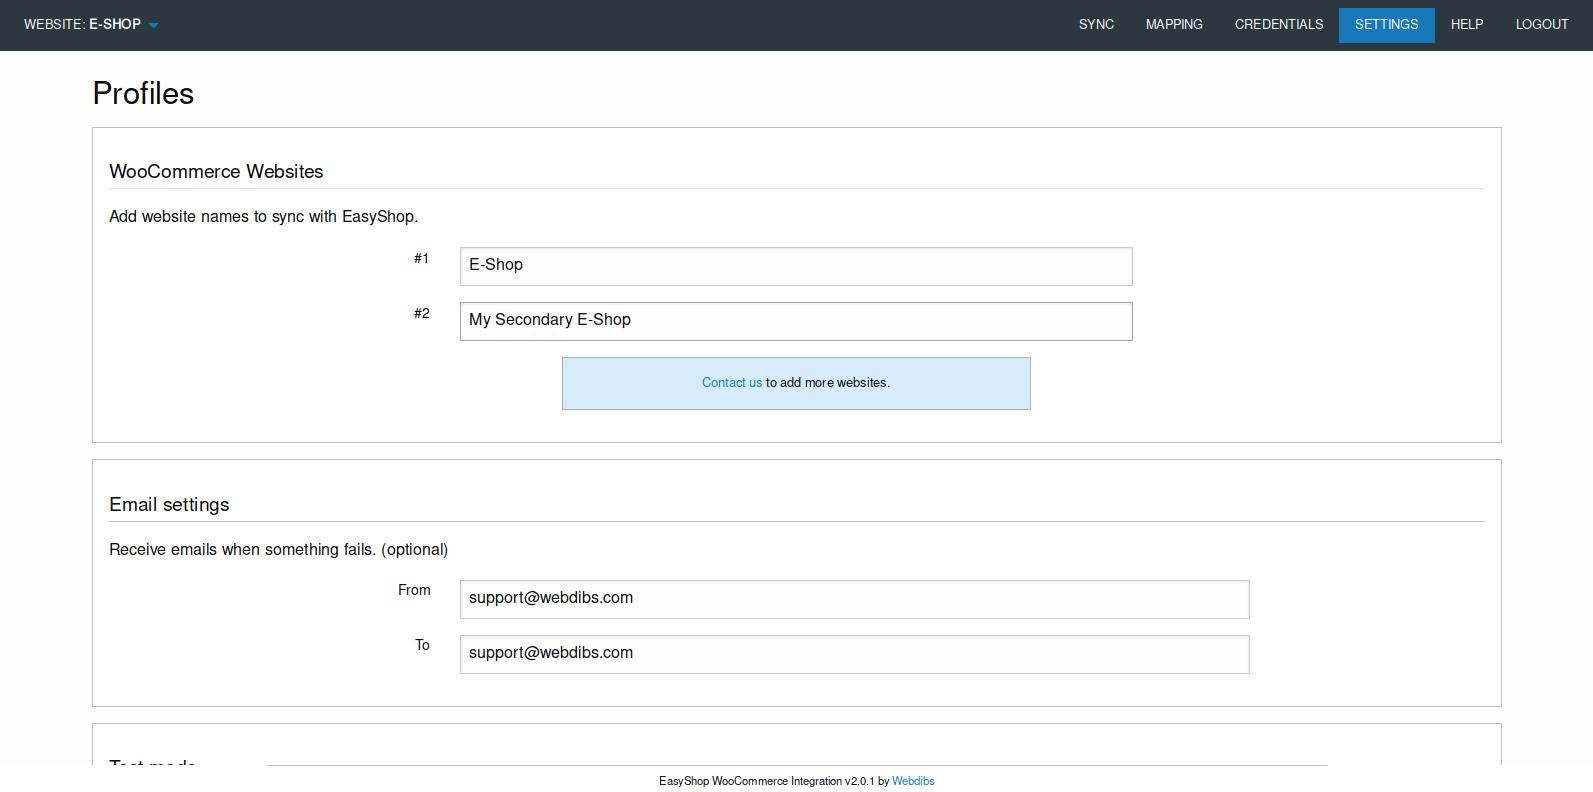 Shopify-EasyShop-Aims360 Sync-API